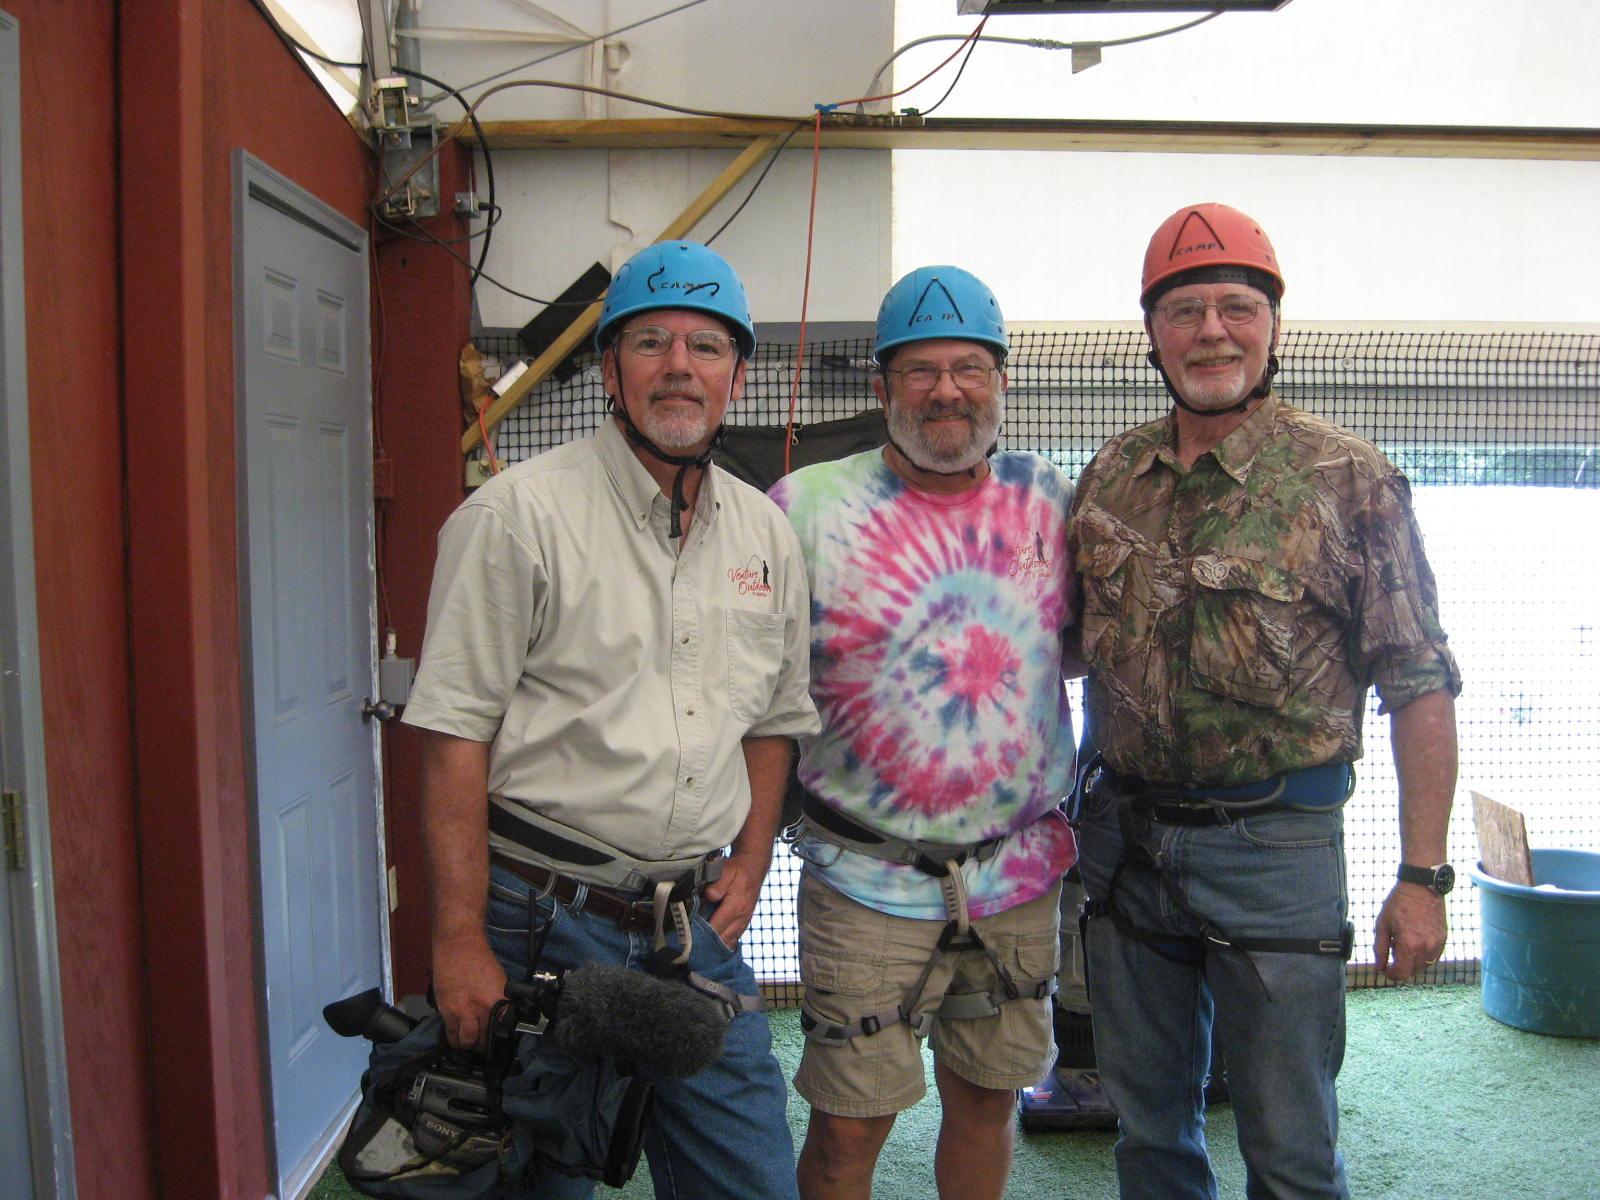 Curt Gantt, Don Day and Steve Kynard suited up to Zipline